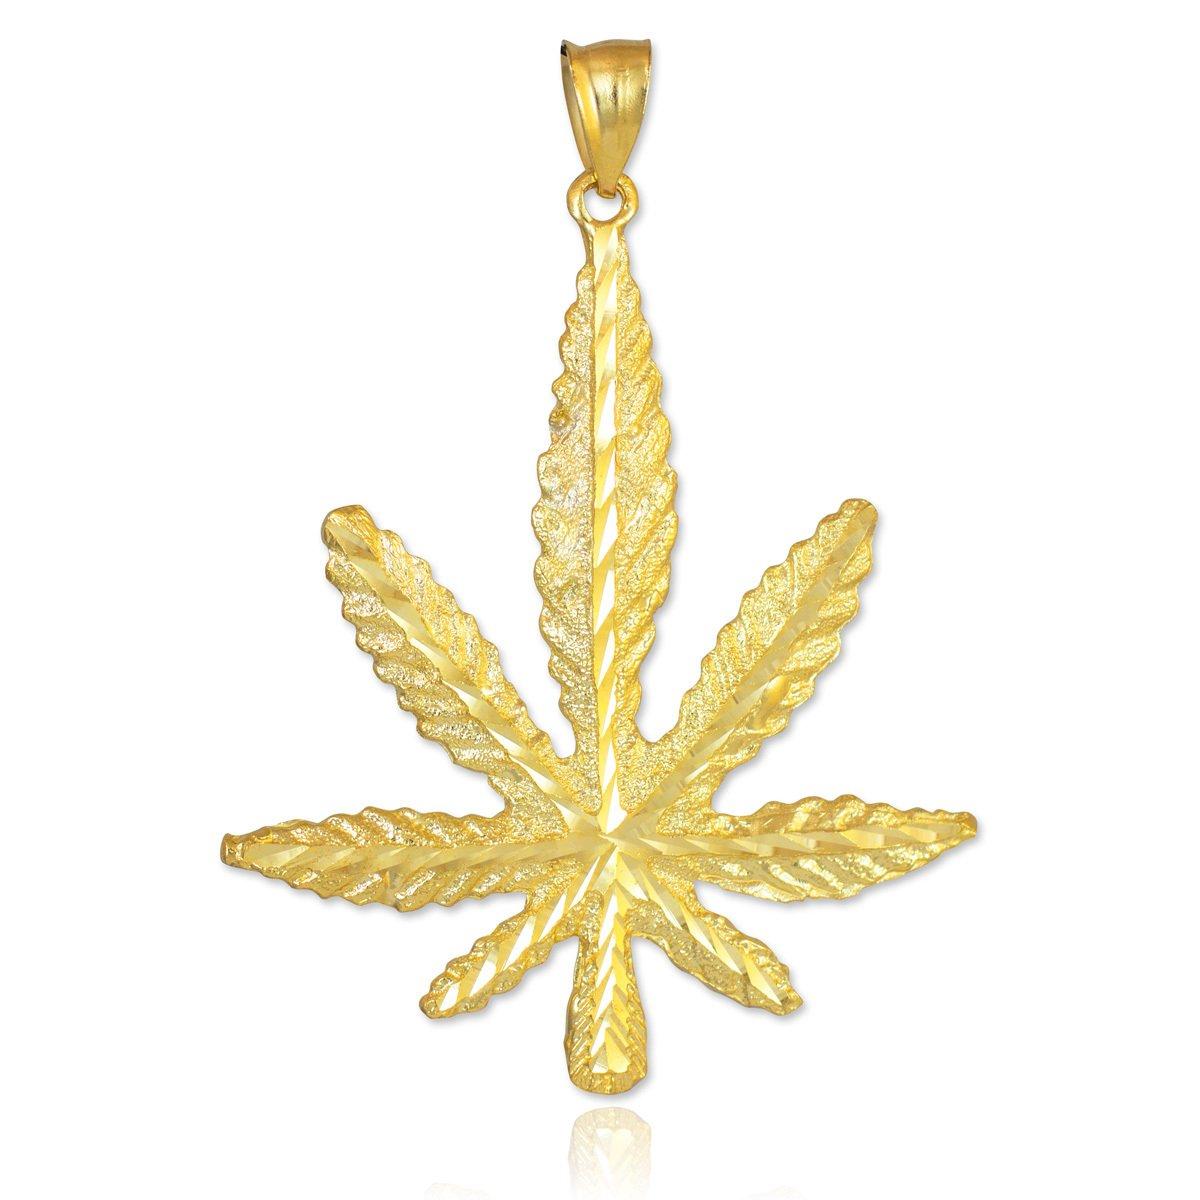 Good Luck Charms Solid 10k Yellow Gold High Polish 420 Pot Ganja Weed Cannabis Charm Marijuana Leaf Pendant